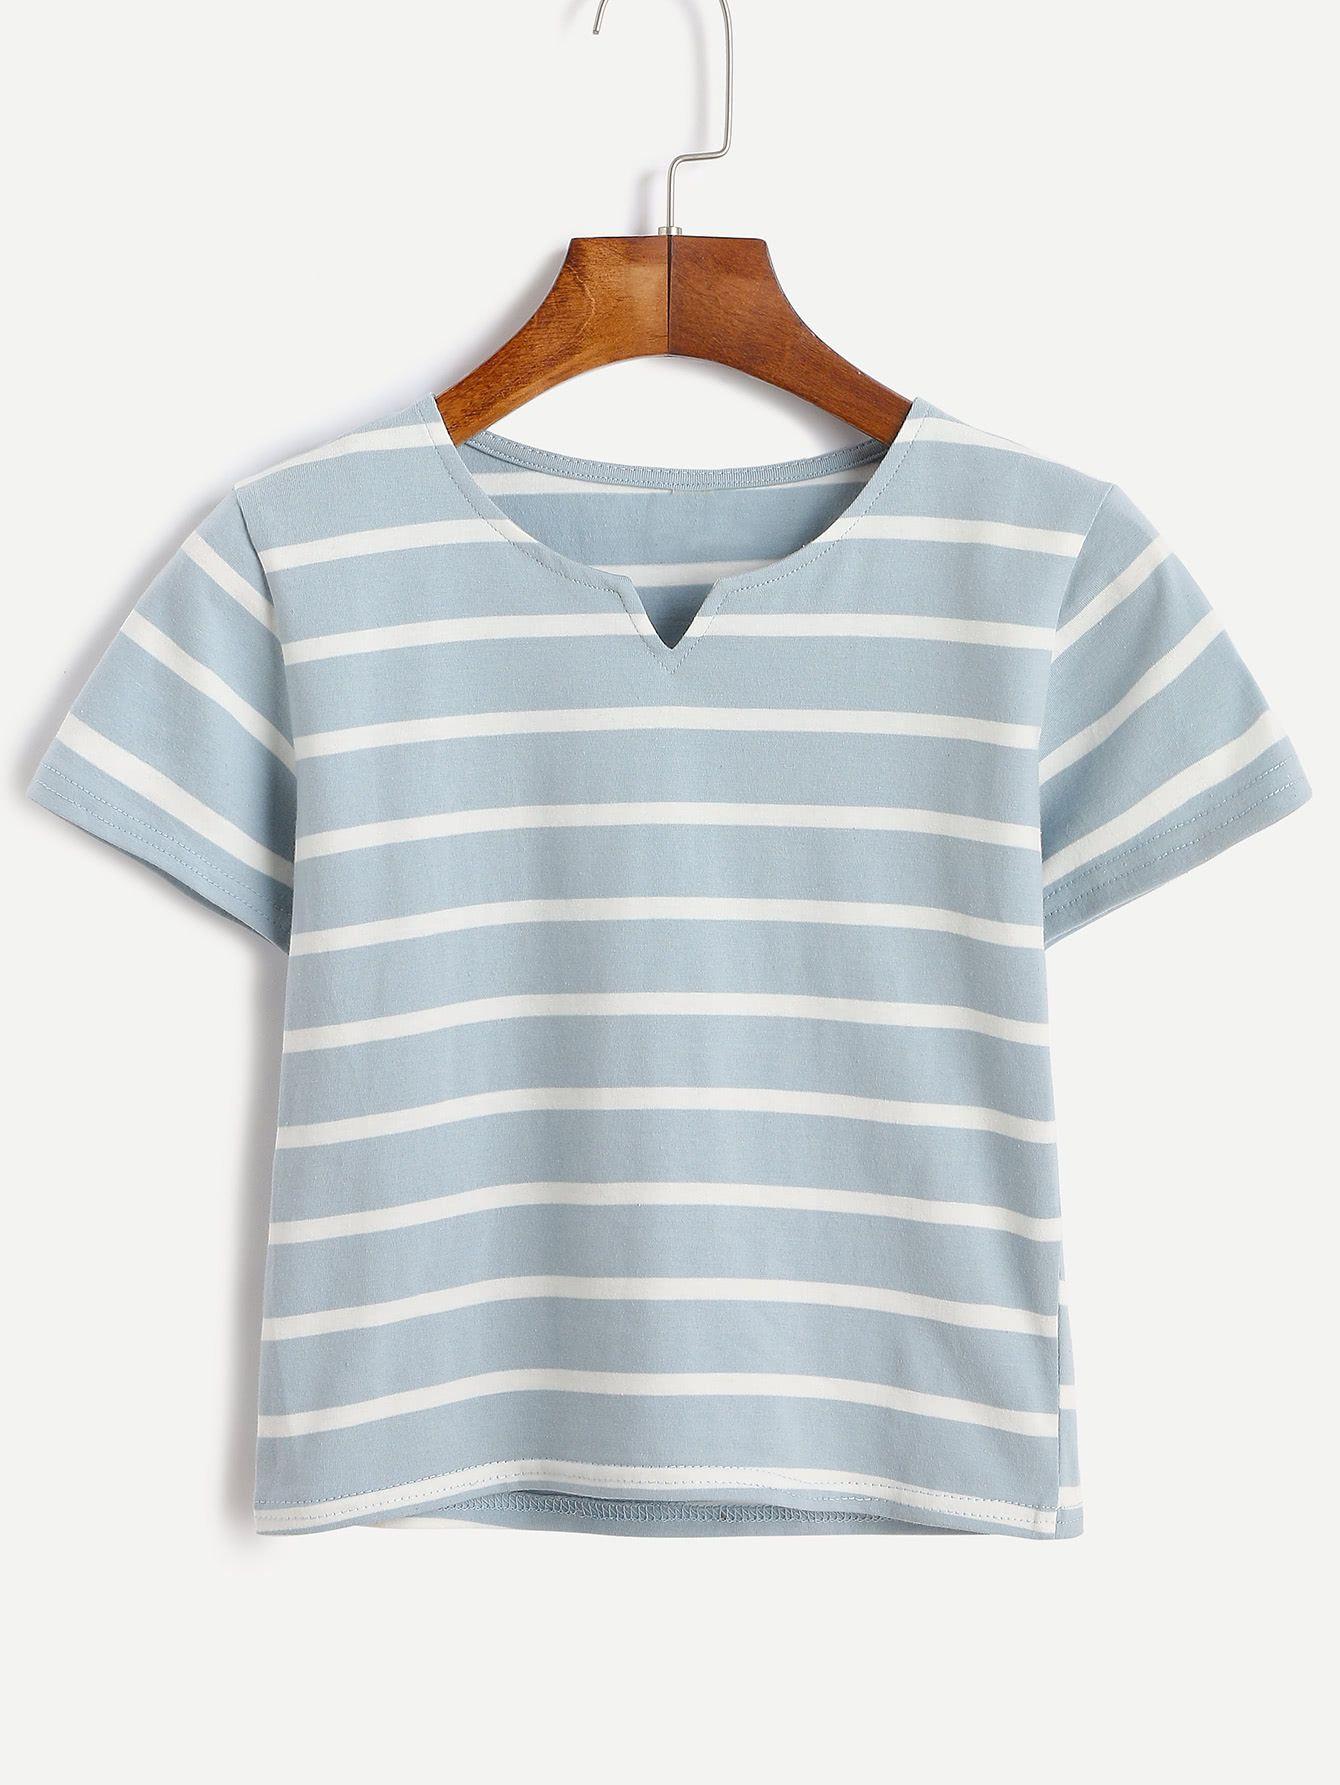 7ce5af5a38 Blue Striped V Cut Crop T-shirt -SheIn(Sheinside) | Outfits in 2019 ...